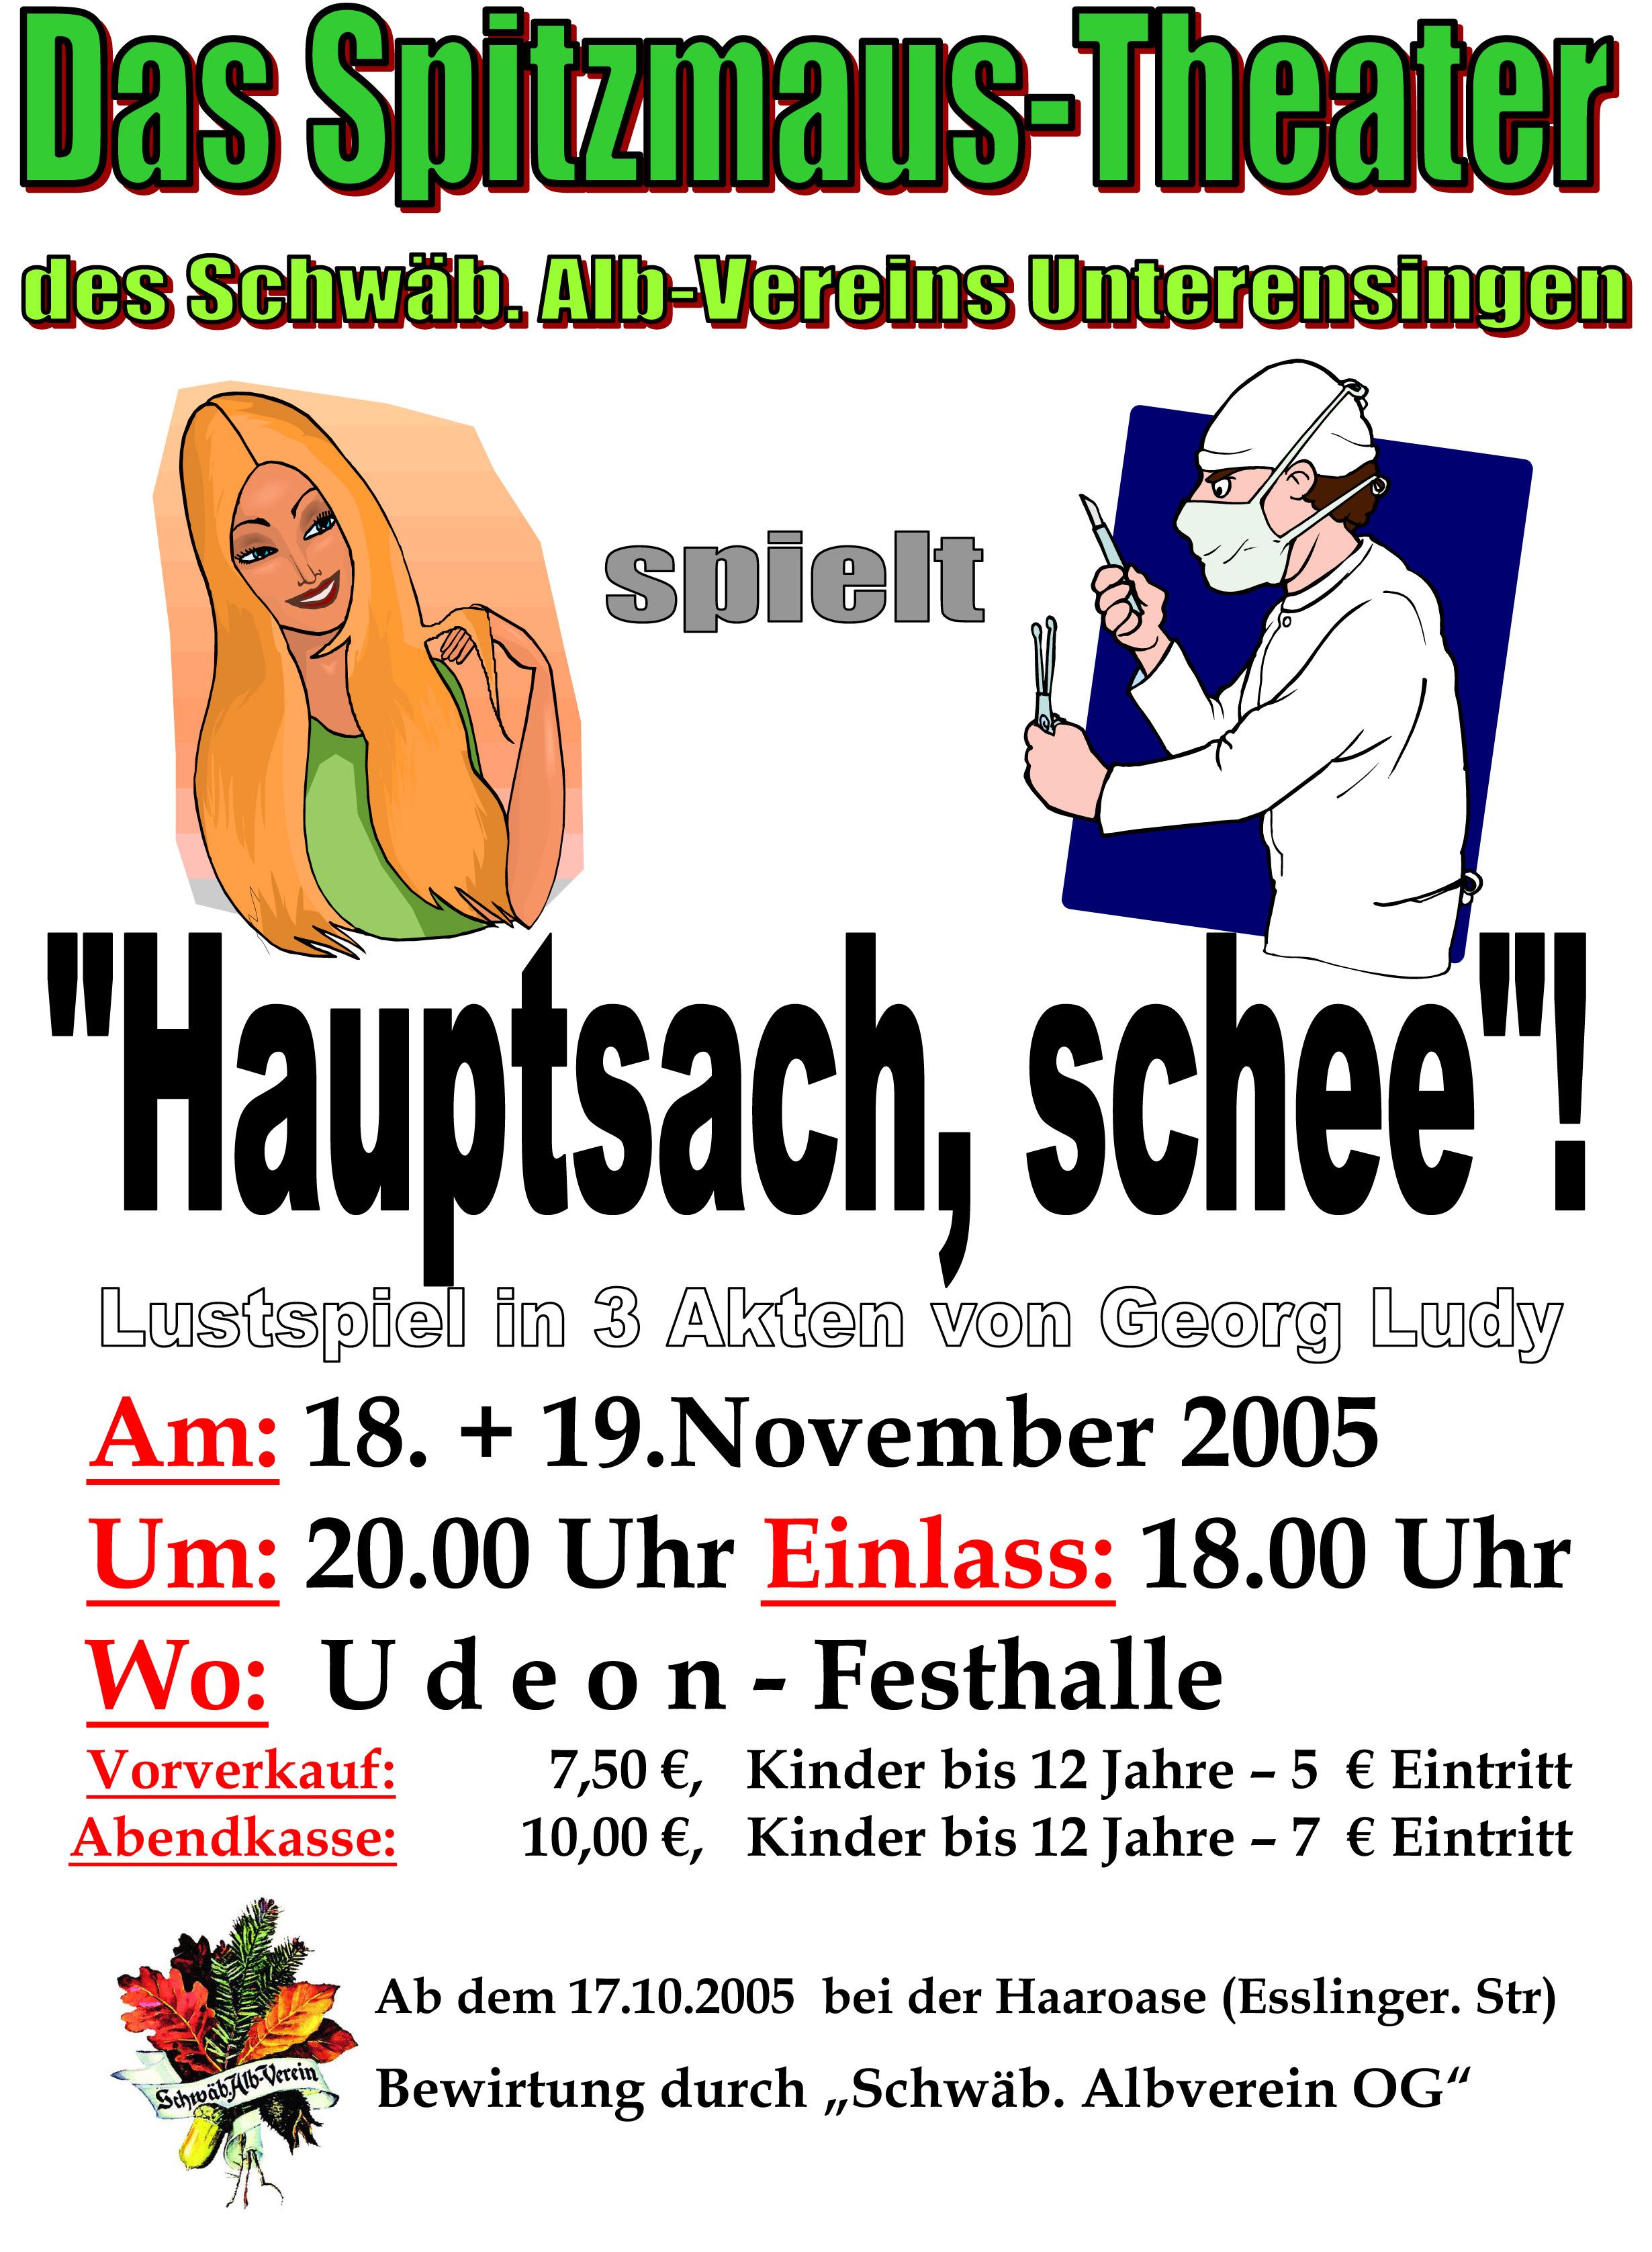 Plakat_2005_Hauptsach-schee